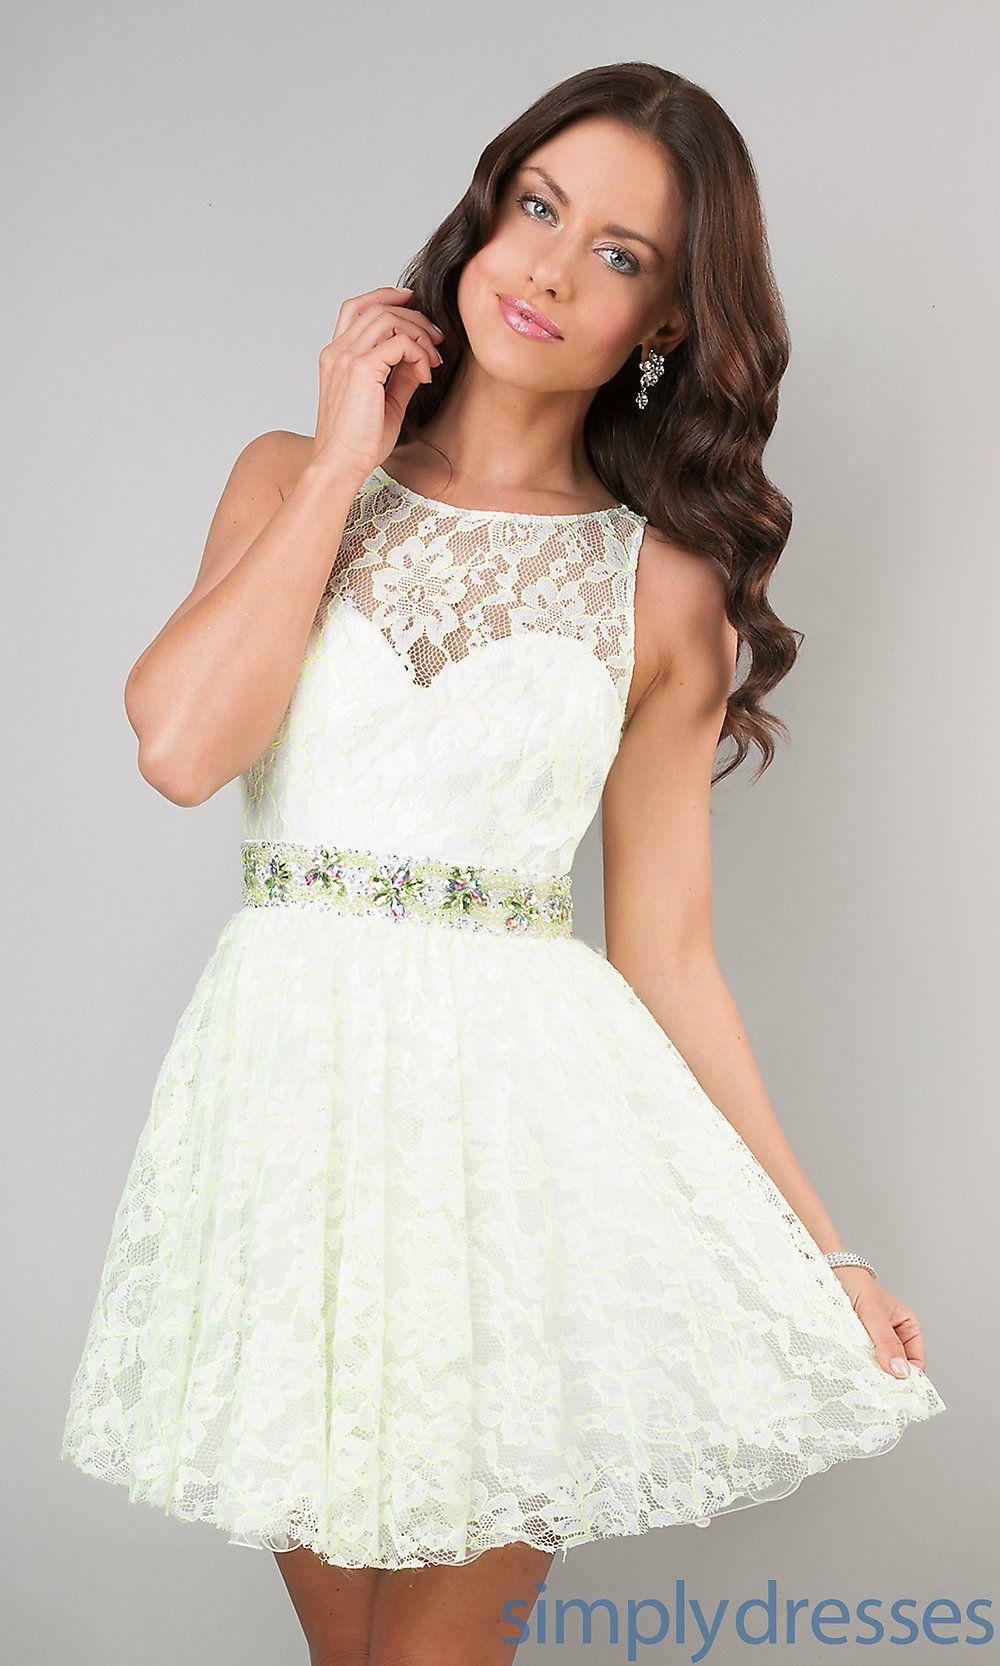 semi formal dresses for teenage girls - Google Search ...